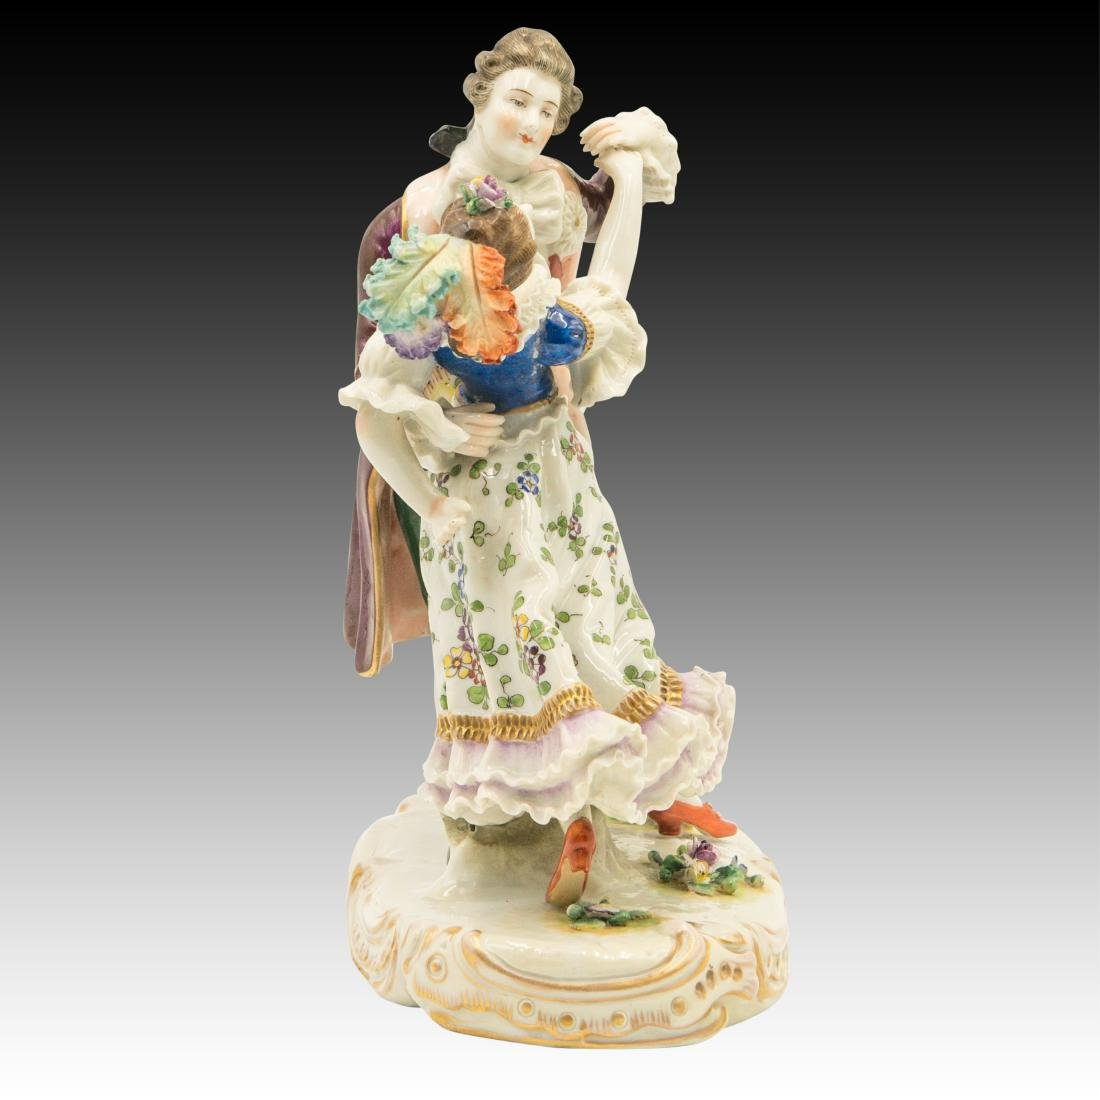 Sitzendorf French Style Dancing Couple Figurine - 4